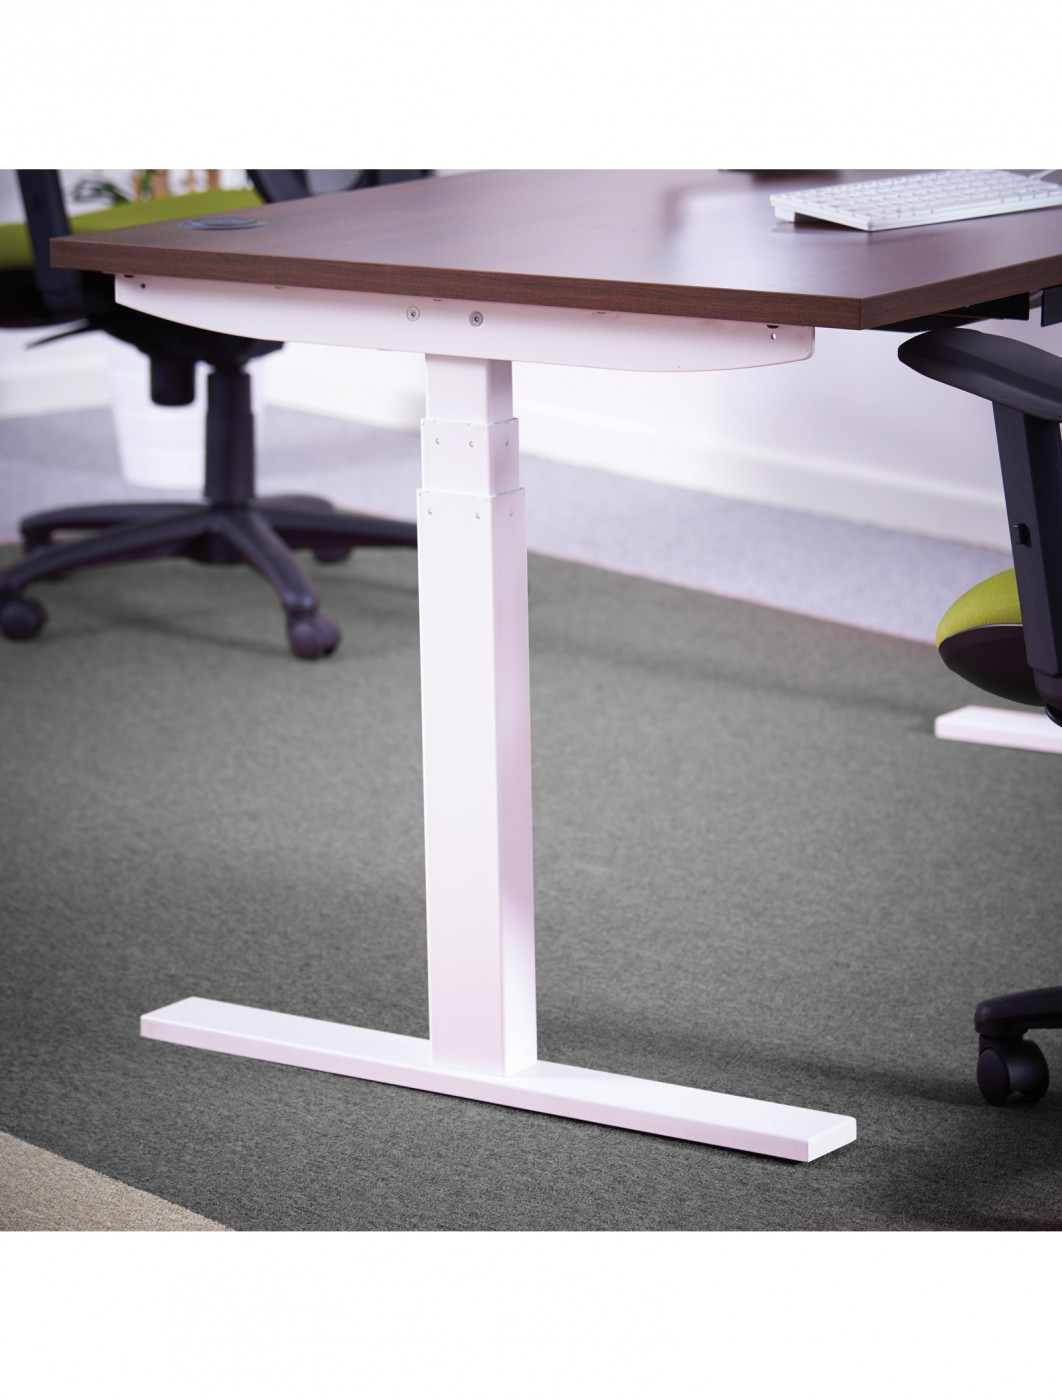 1400mm Wide Elev8 Sit Stand Desk EV14S   Enlarged View